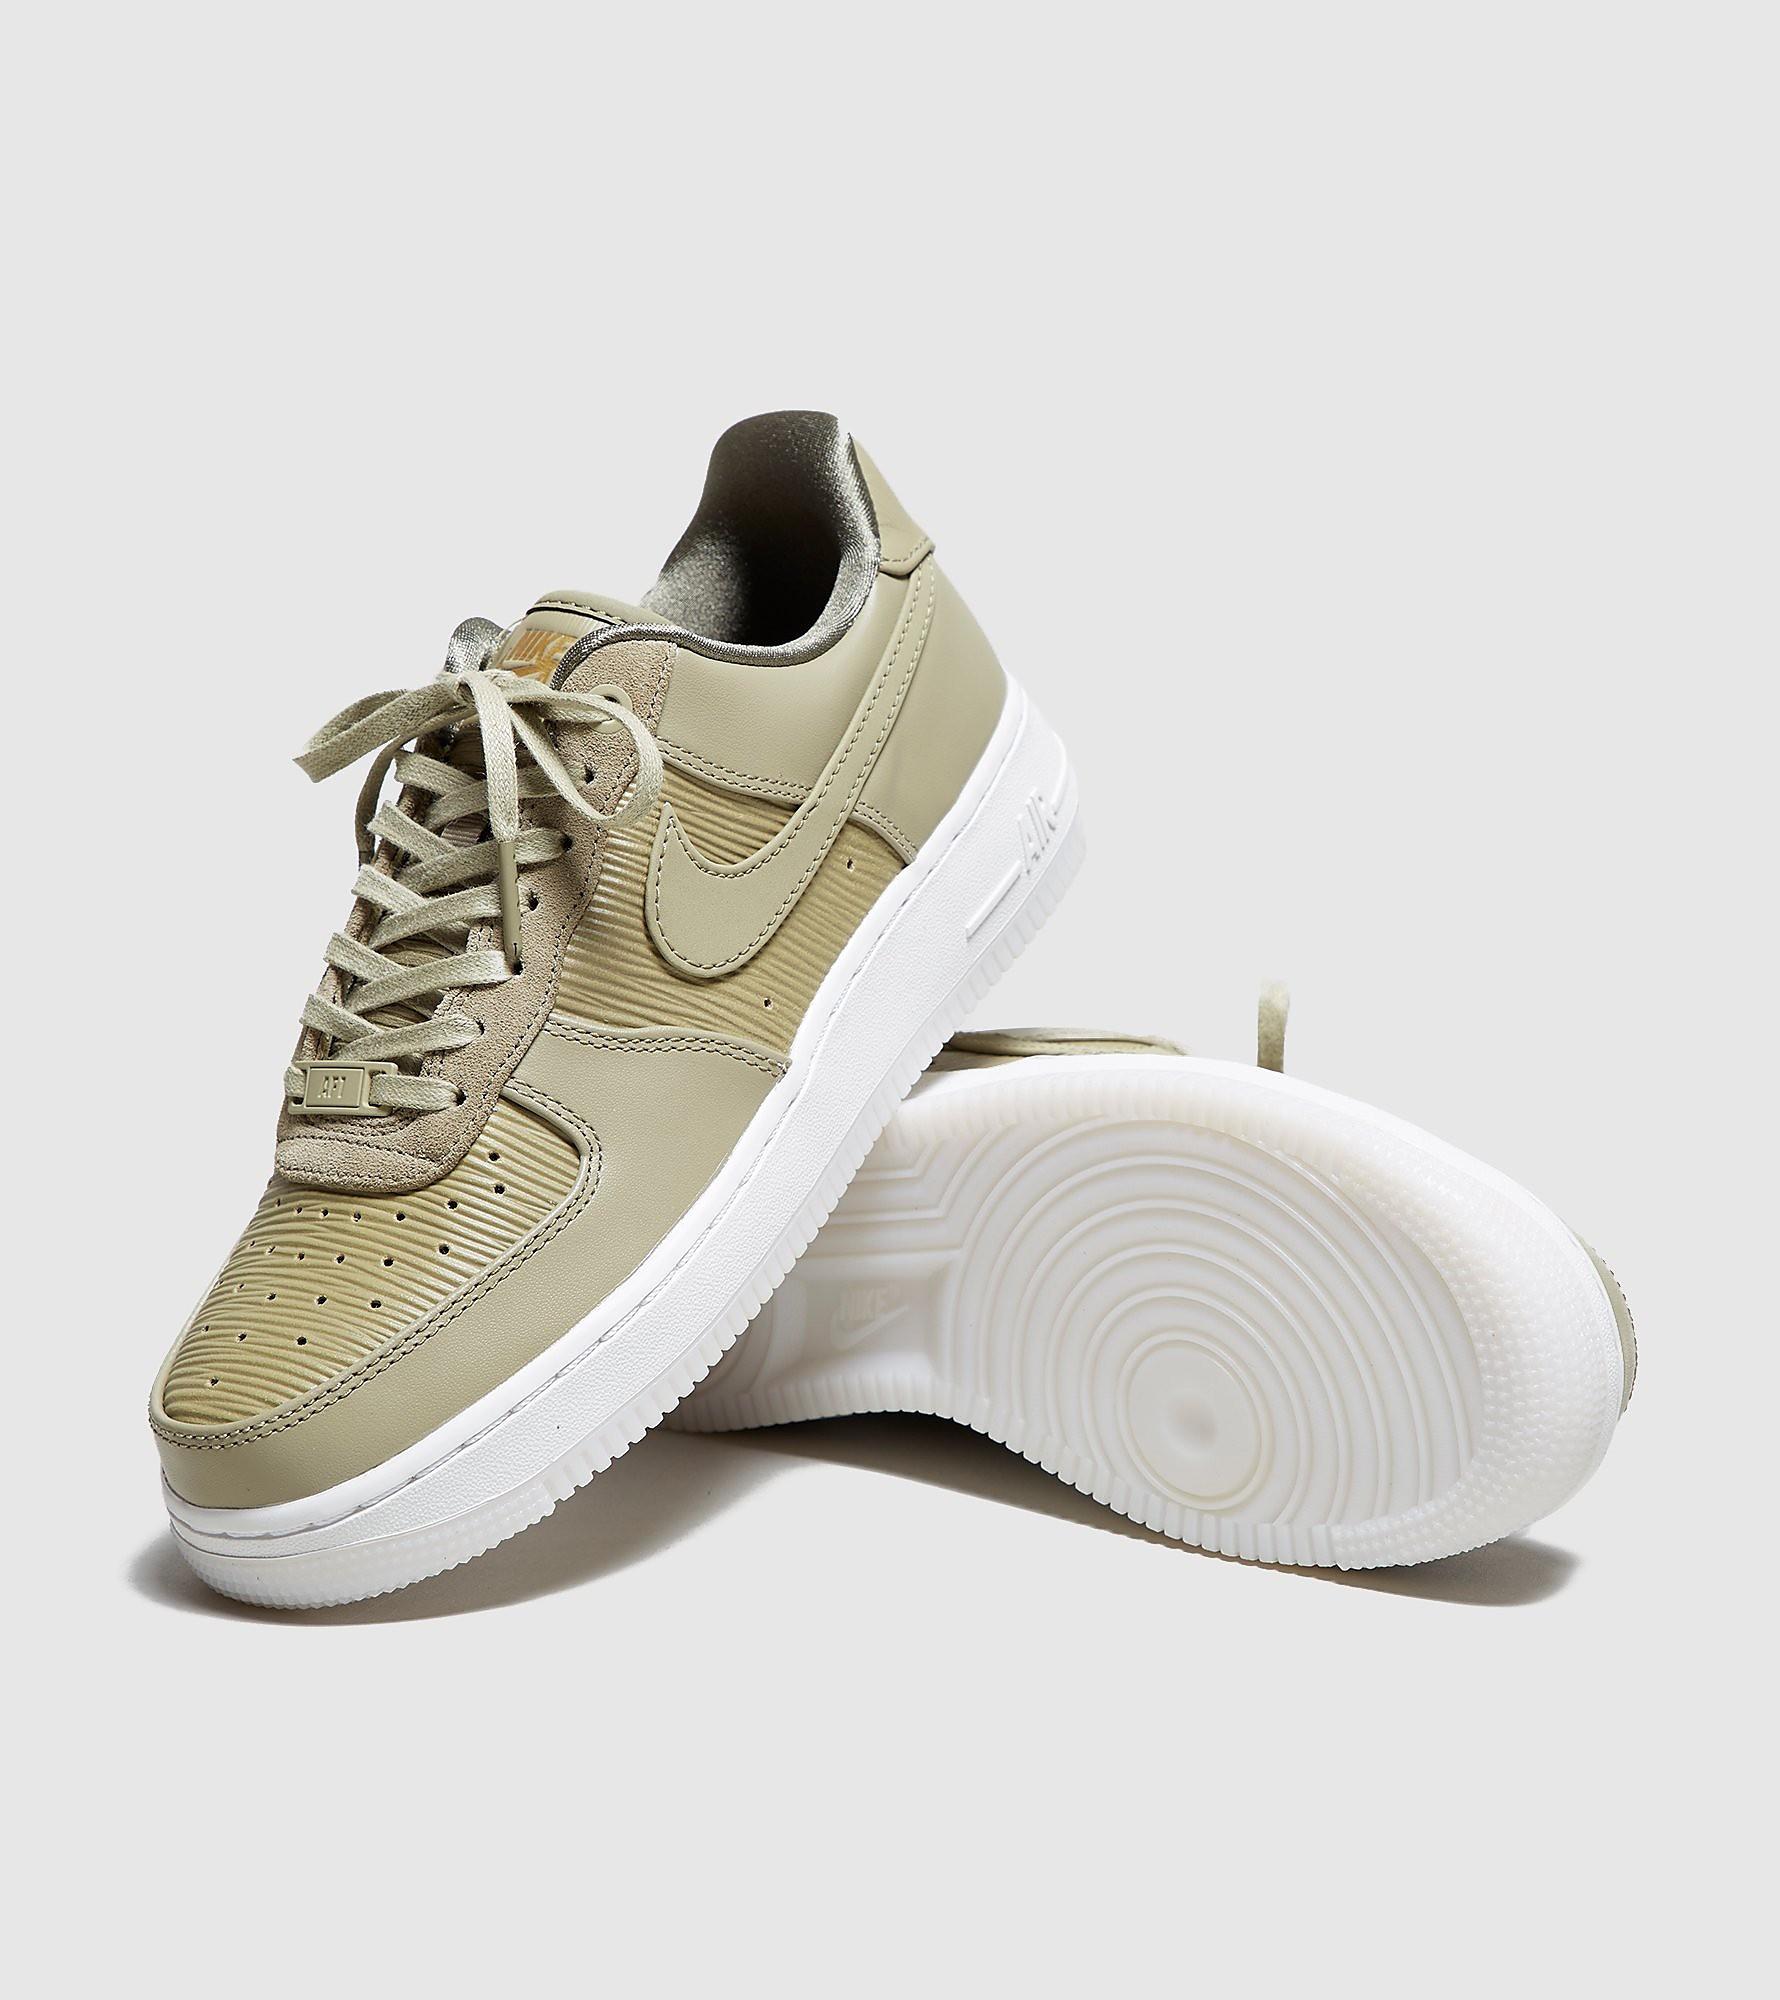 Nike Air Force 1 '07 LX Dam